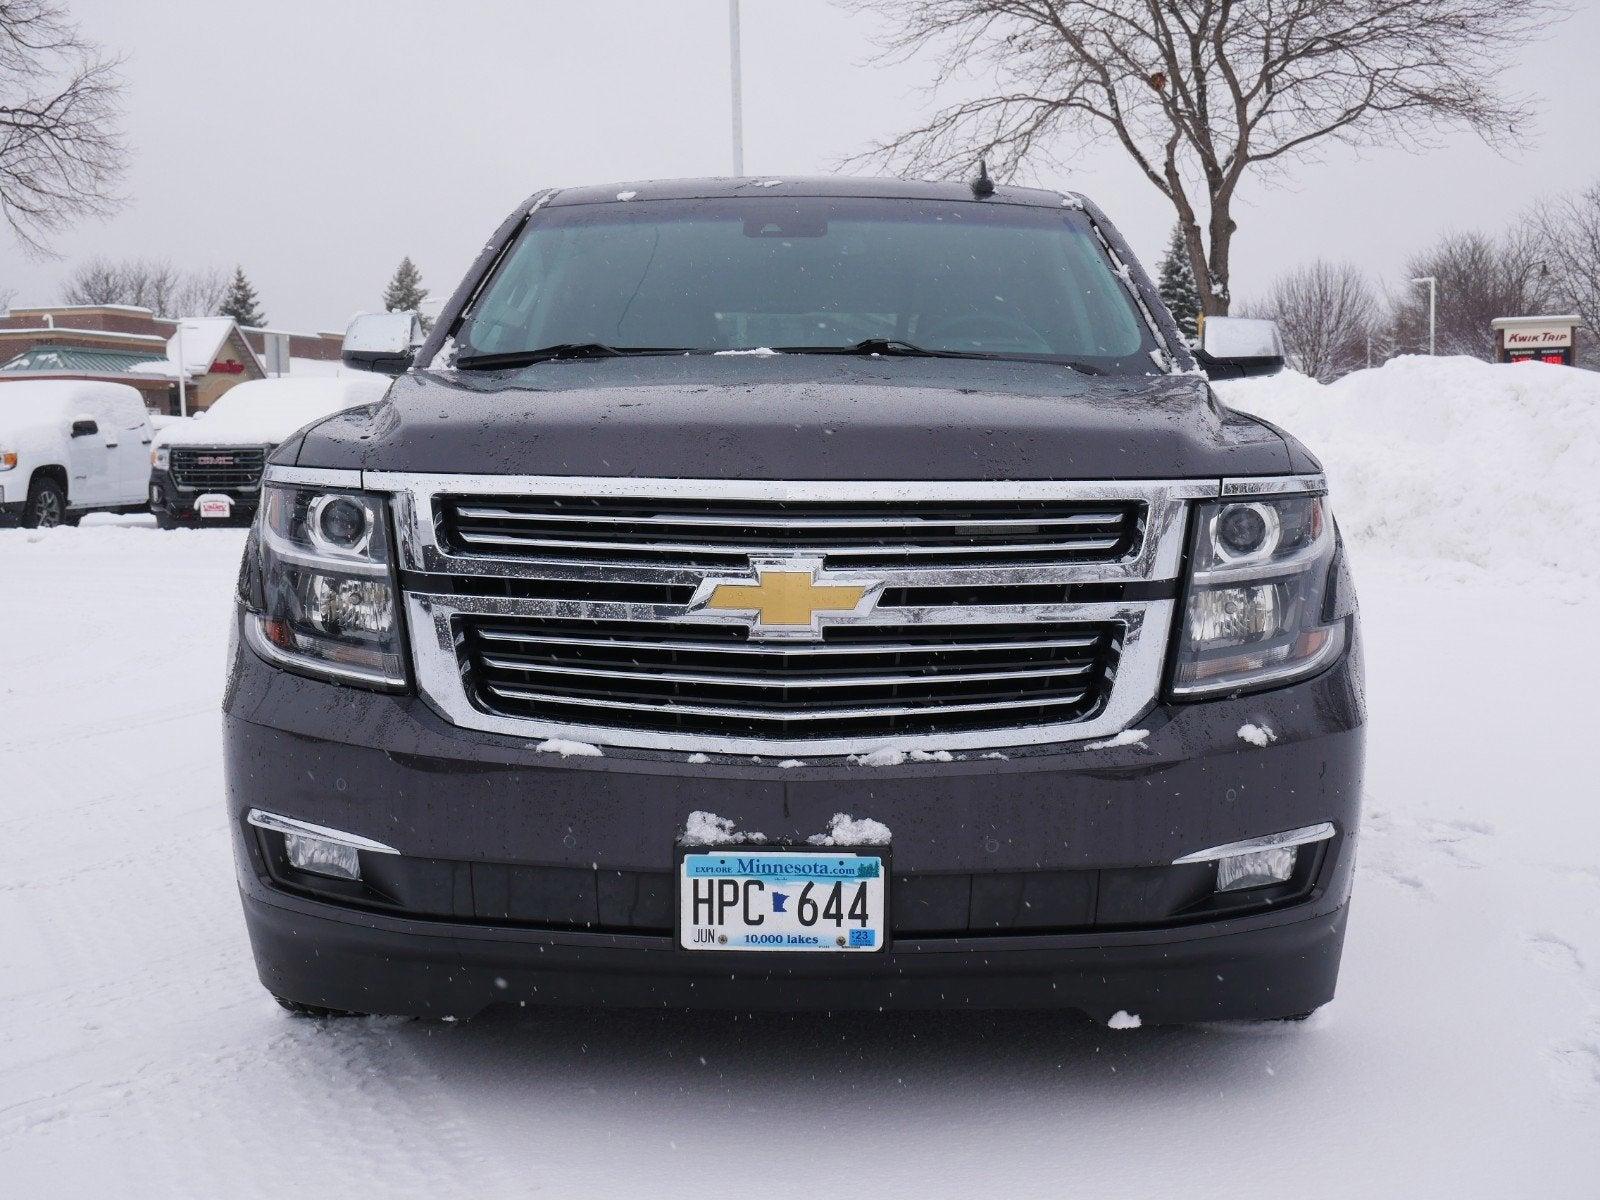 Used 2016 Chevrolet Suburban LTZ with VIN 1GNSKJKC6GR418320 for sale in Apple Valley, Minnesota